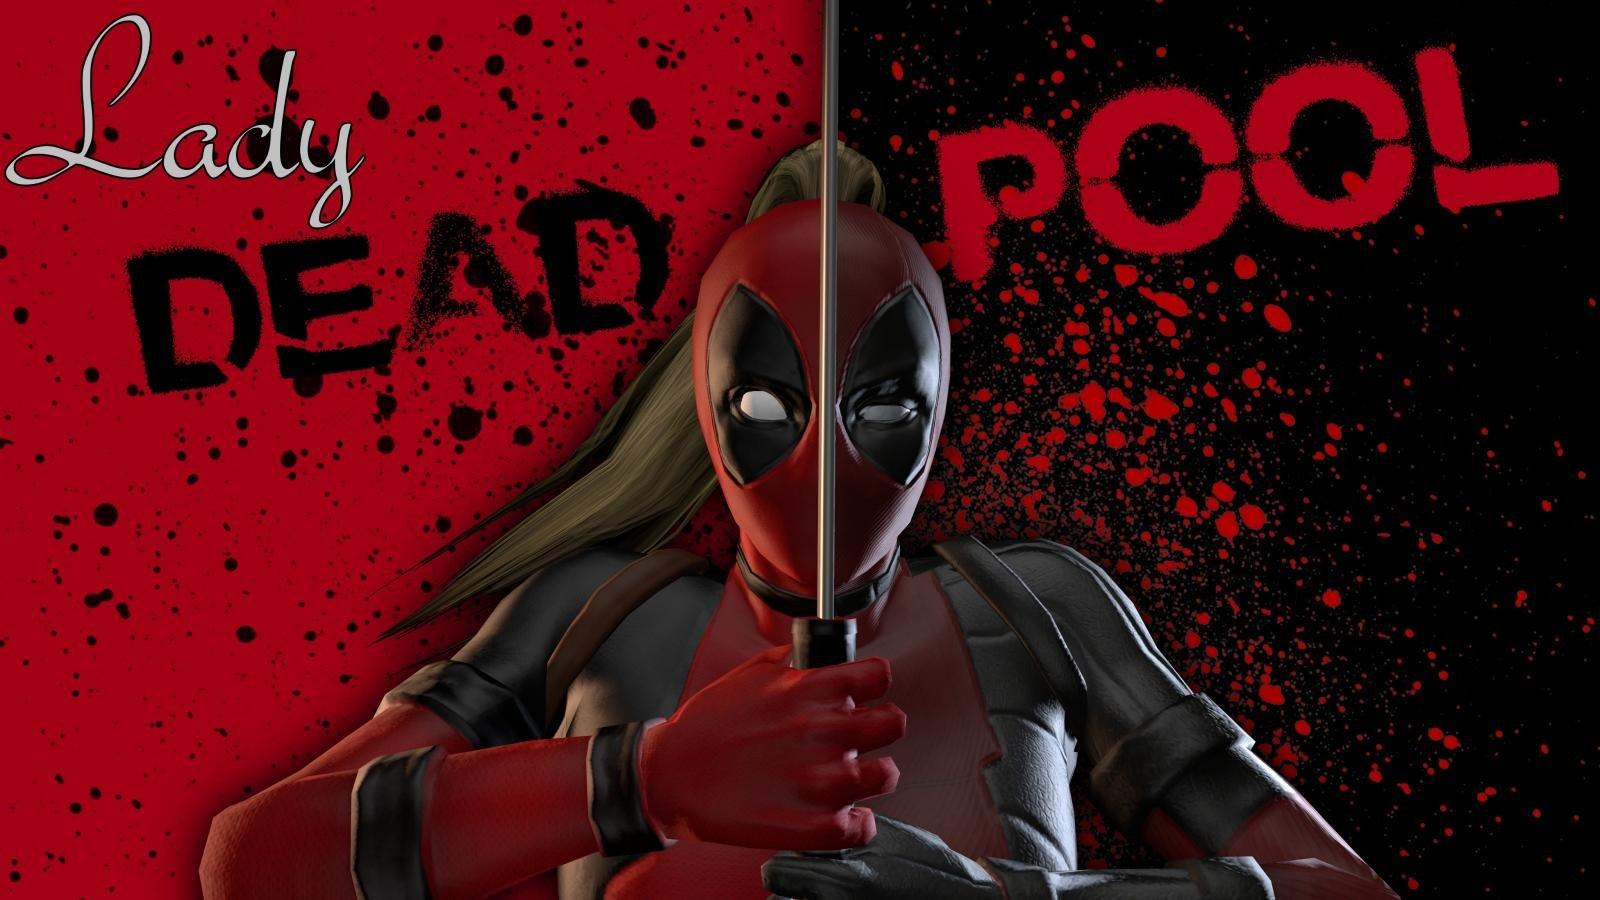 High Resolution Lady Deadpool Hd 1600x900 Wallpaper Id 327372 For